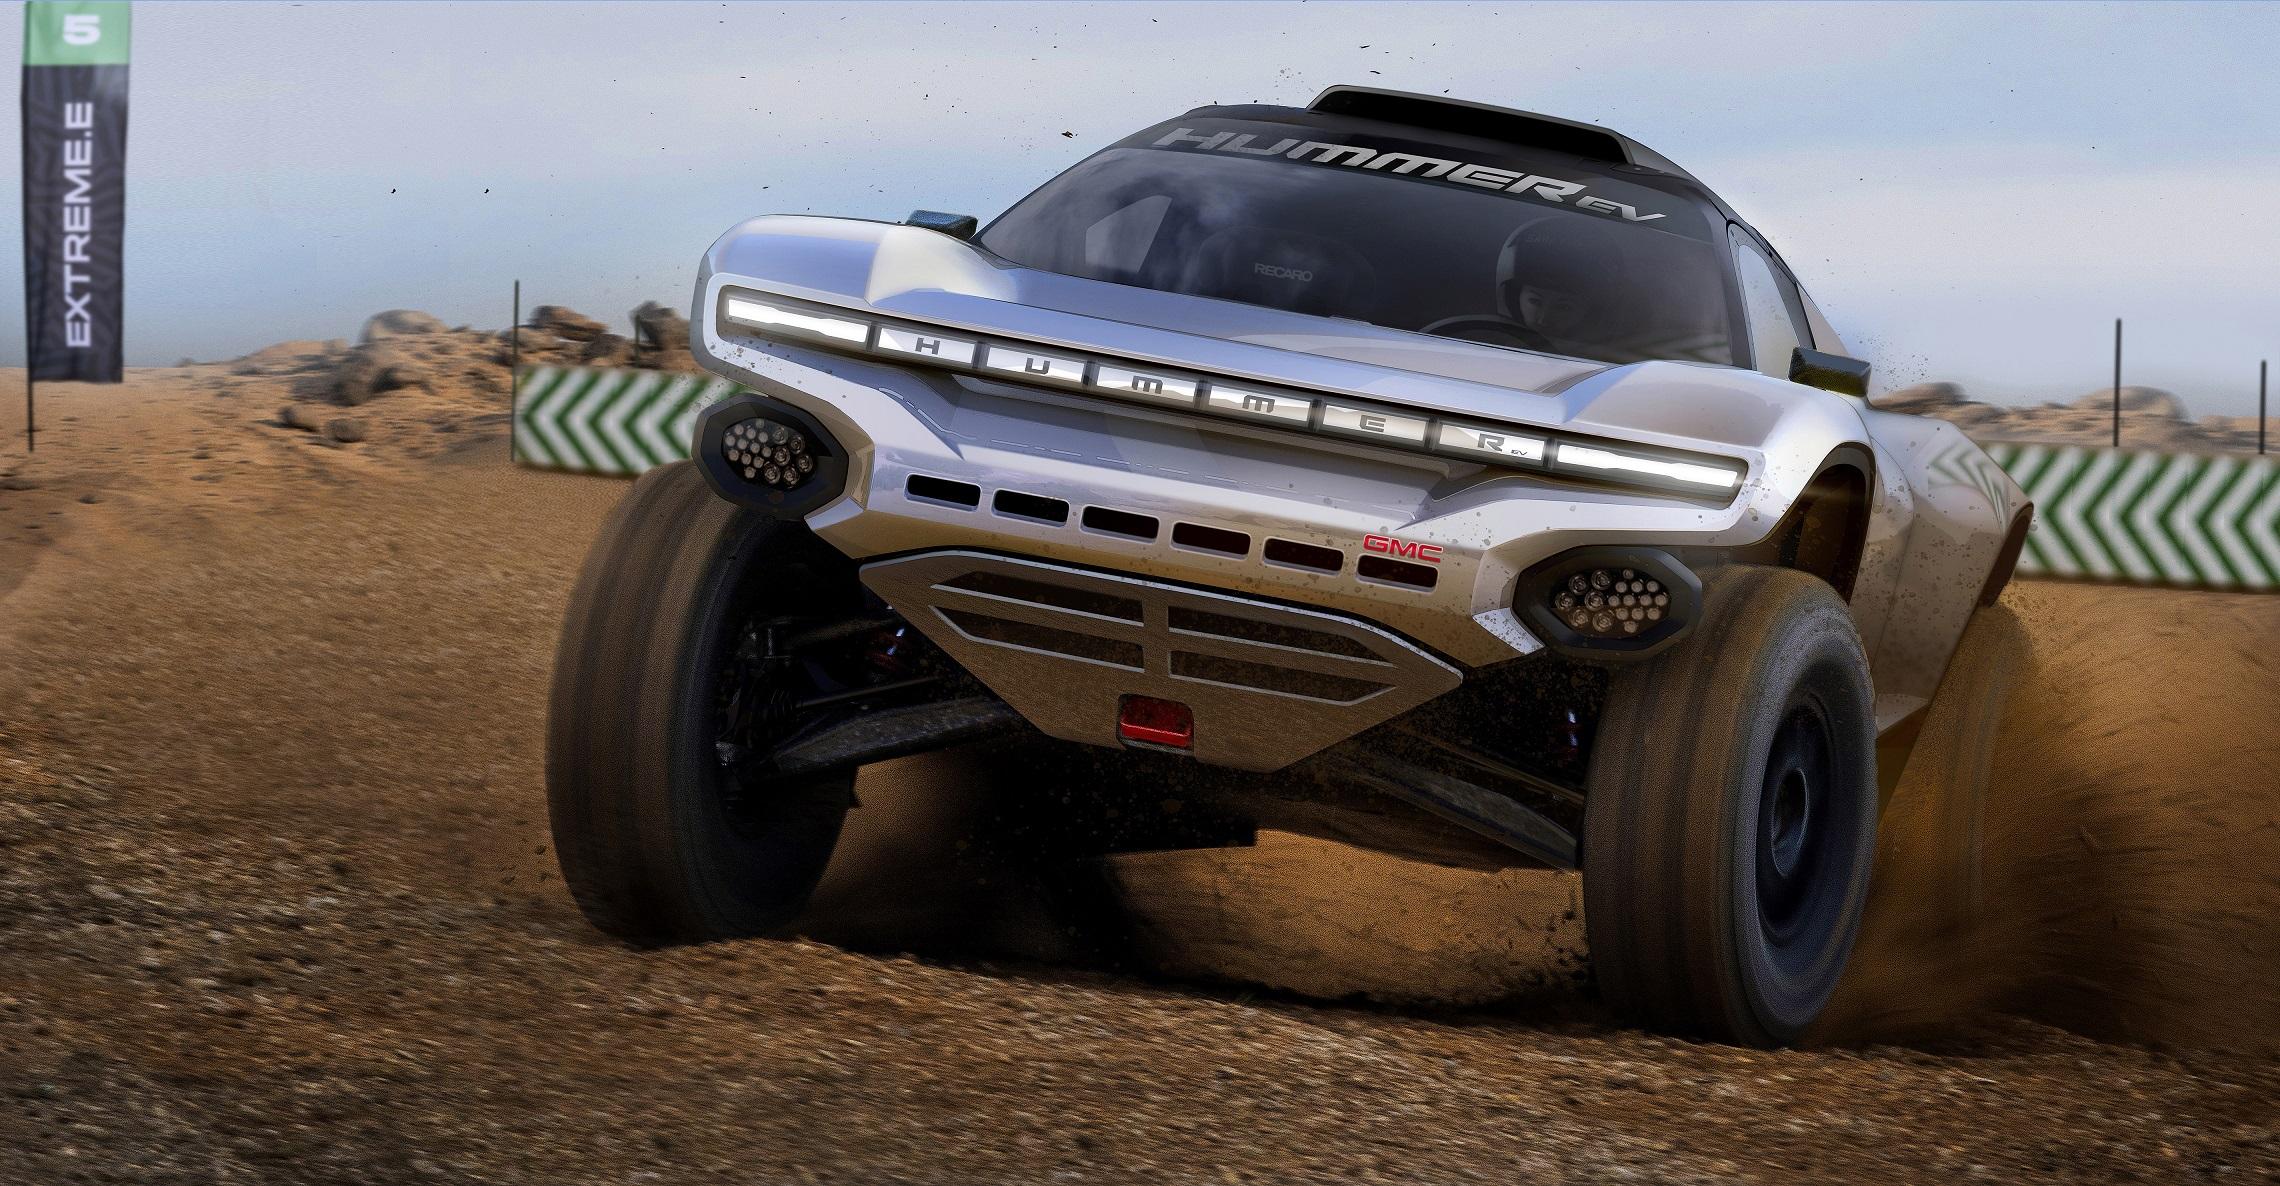 GMC HUMMER EV Teams Up for Off-Road Extreme E Racing Series kick-starting in Saudi Arabia next April